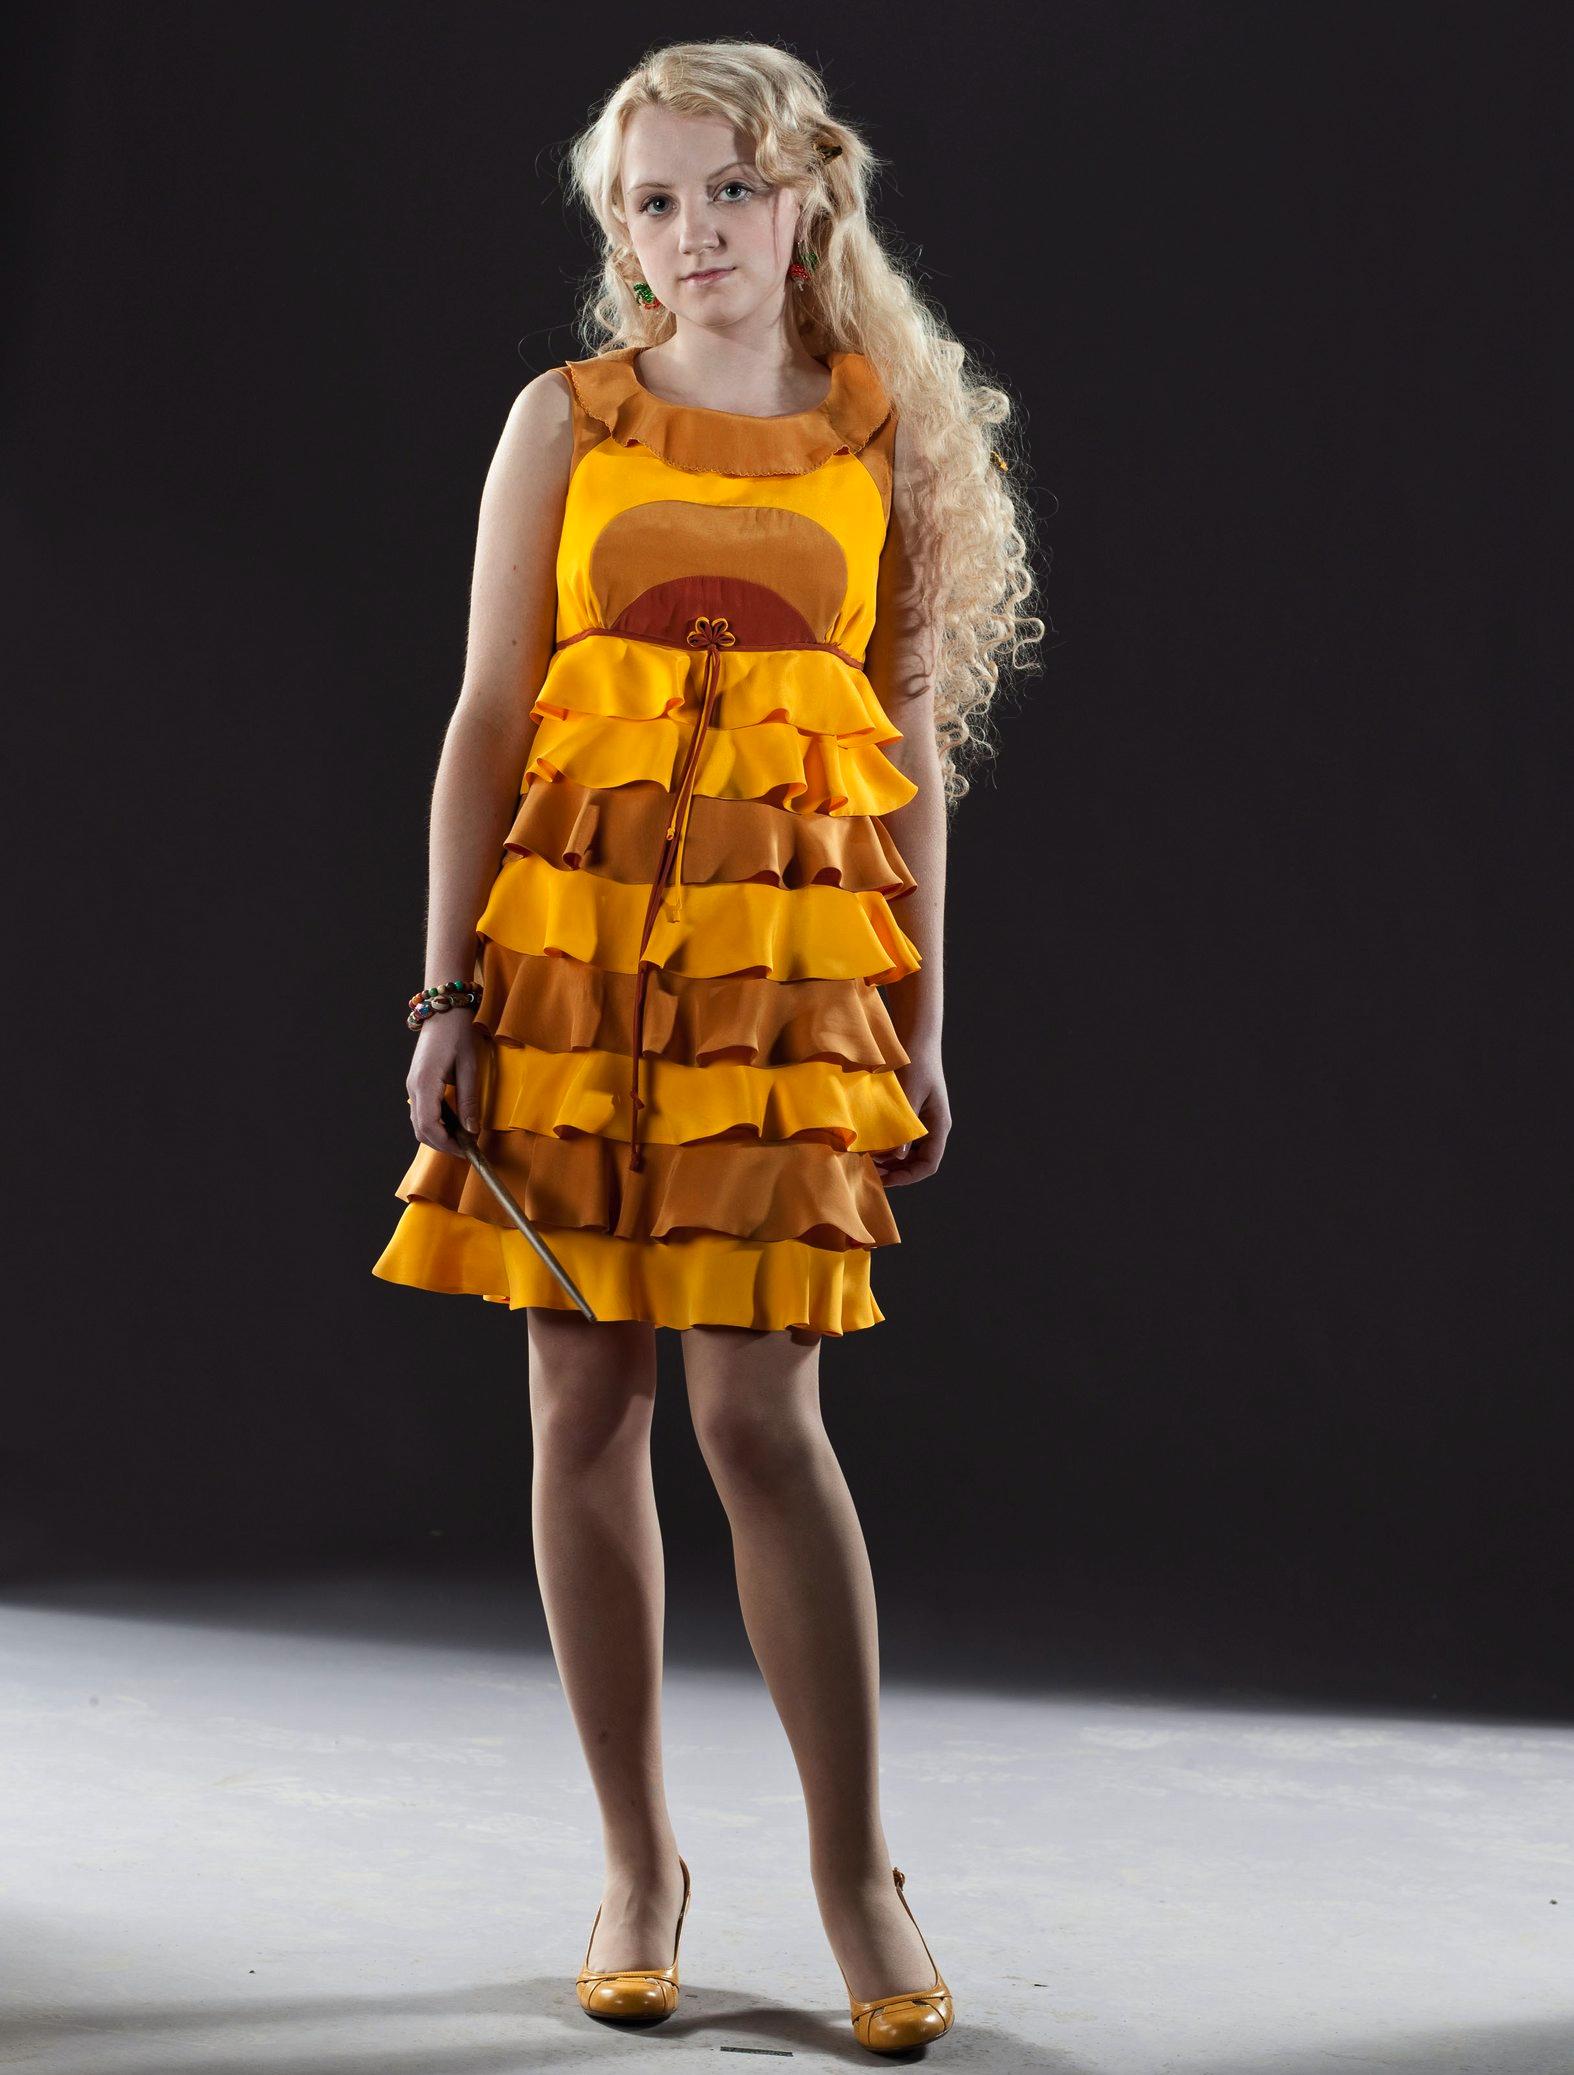 Luna Lovegood\'s yellow dress robes | Harry Potter Wiki | FANDOM ...